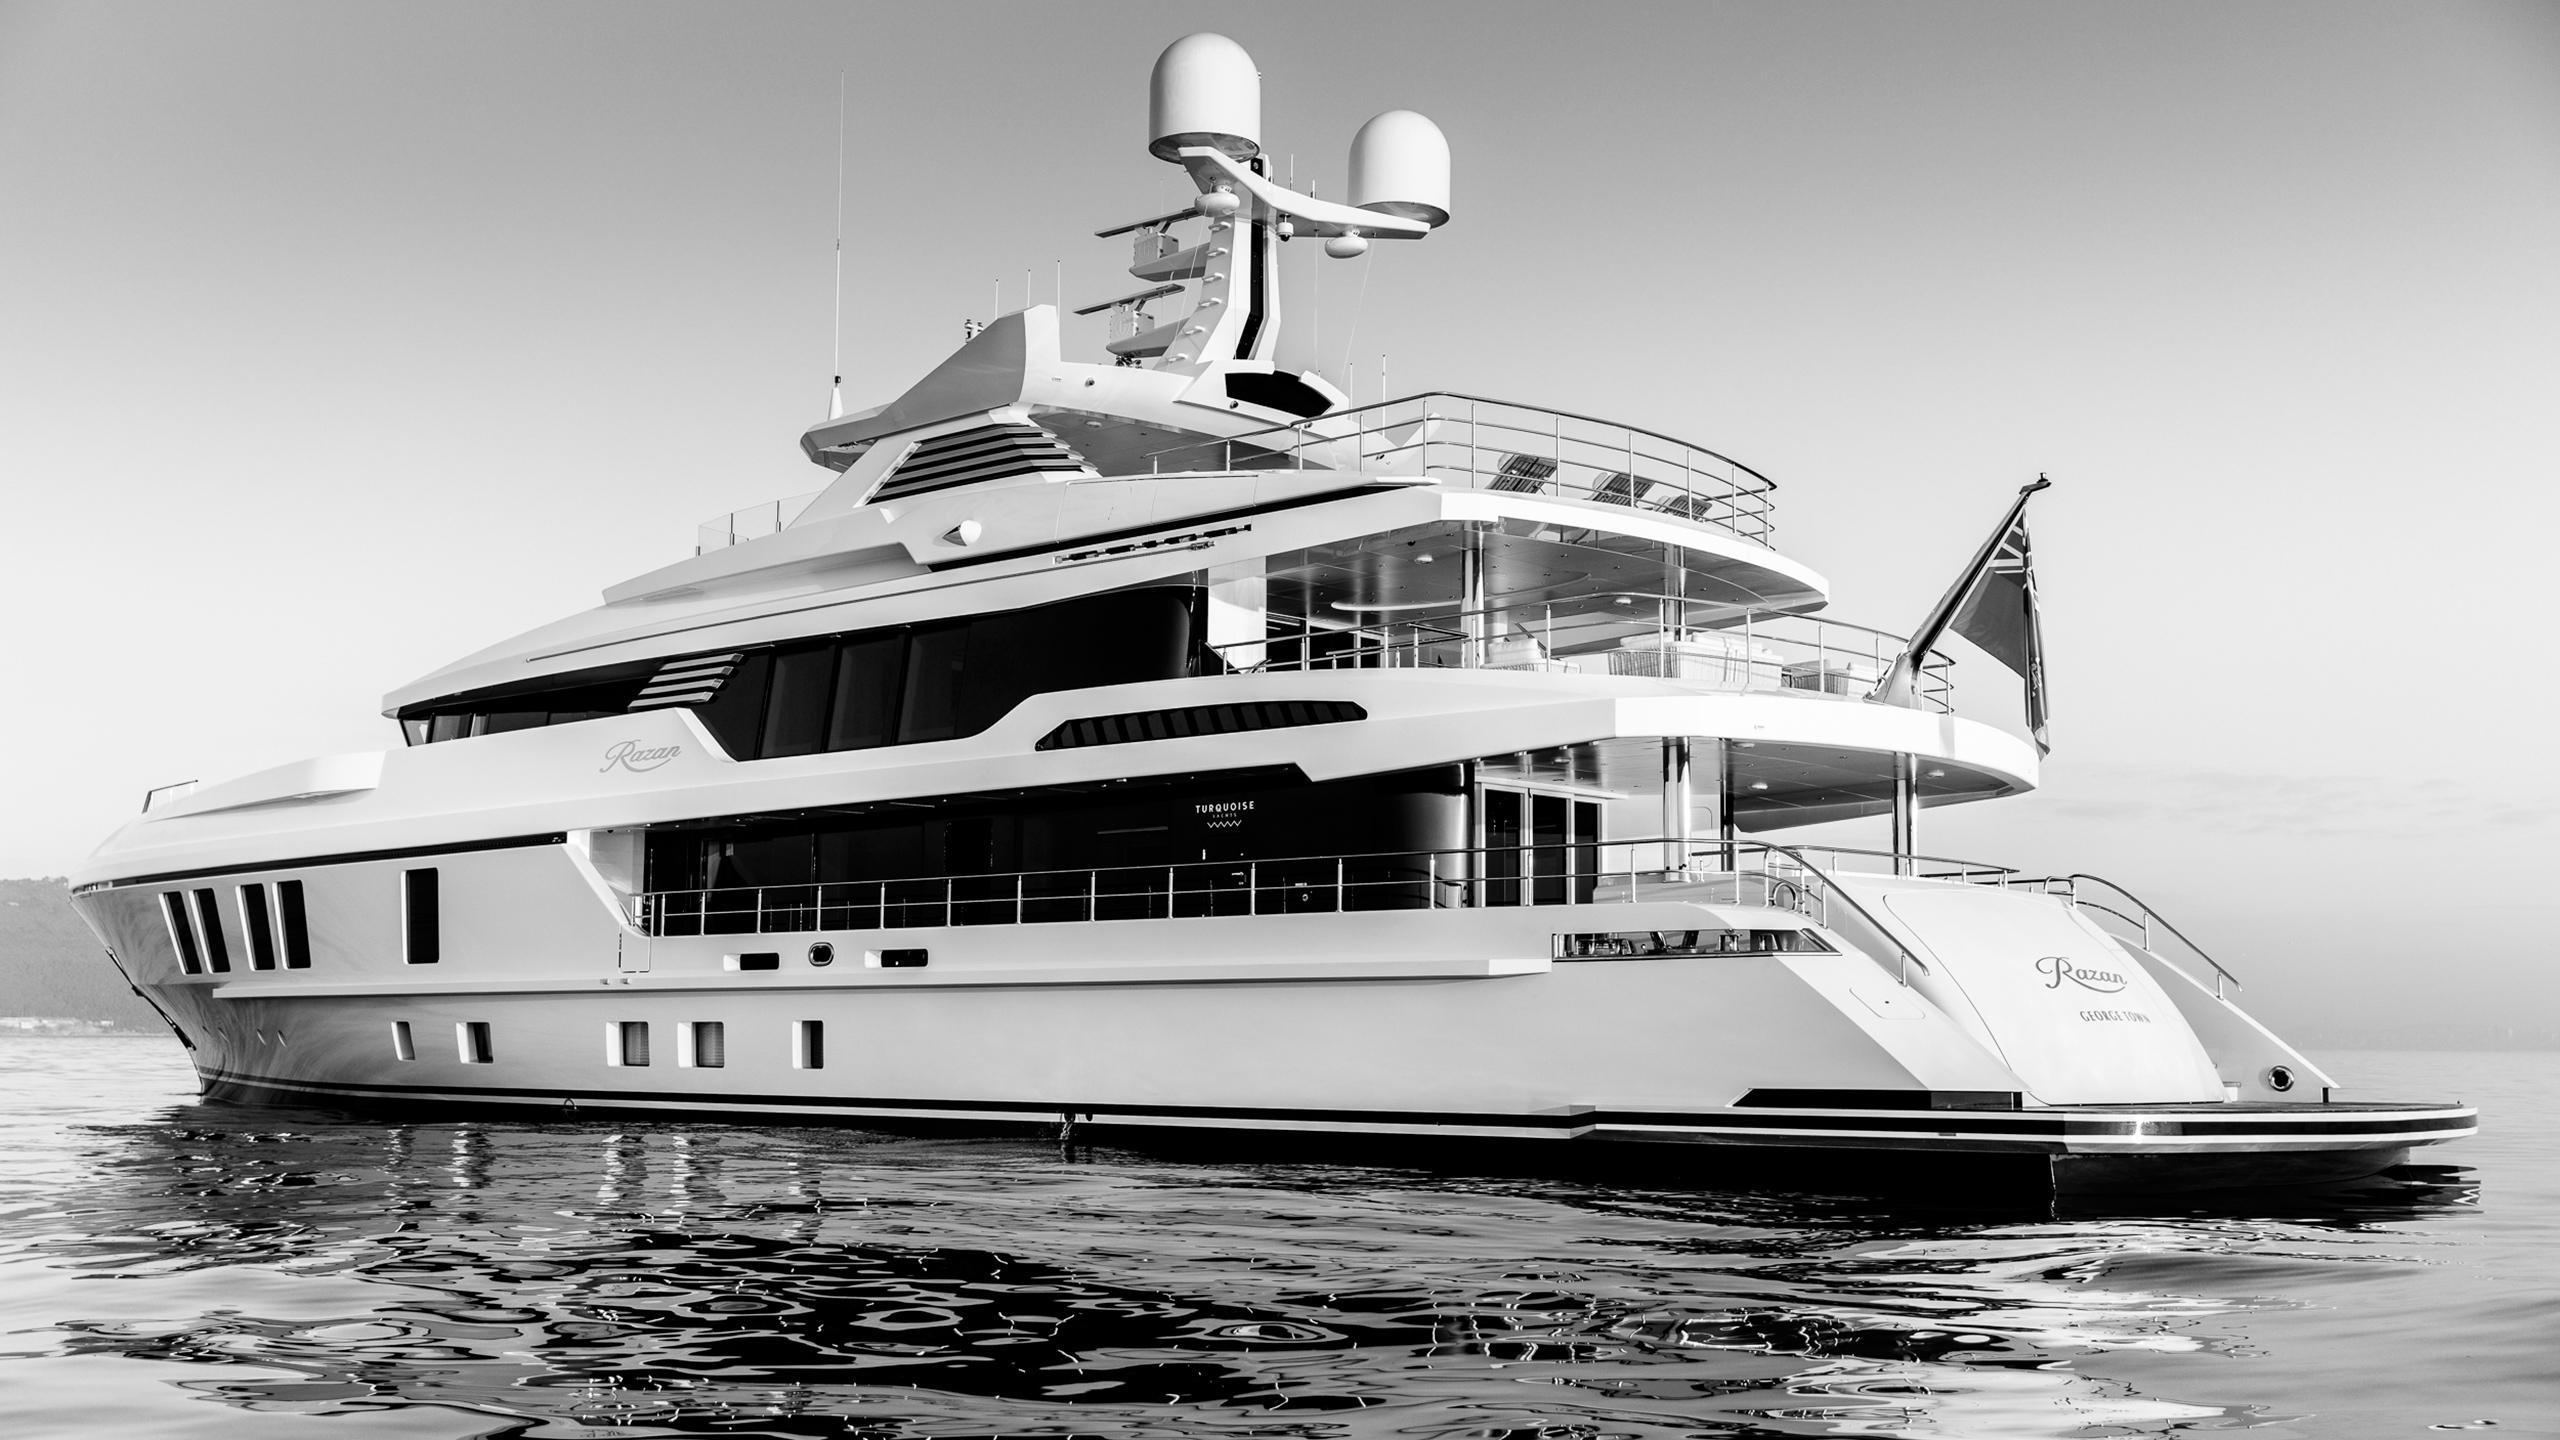 roe razan motoryacht turquoise yachts 2017 47m half stern